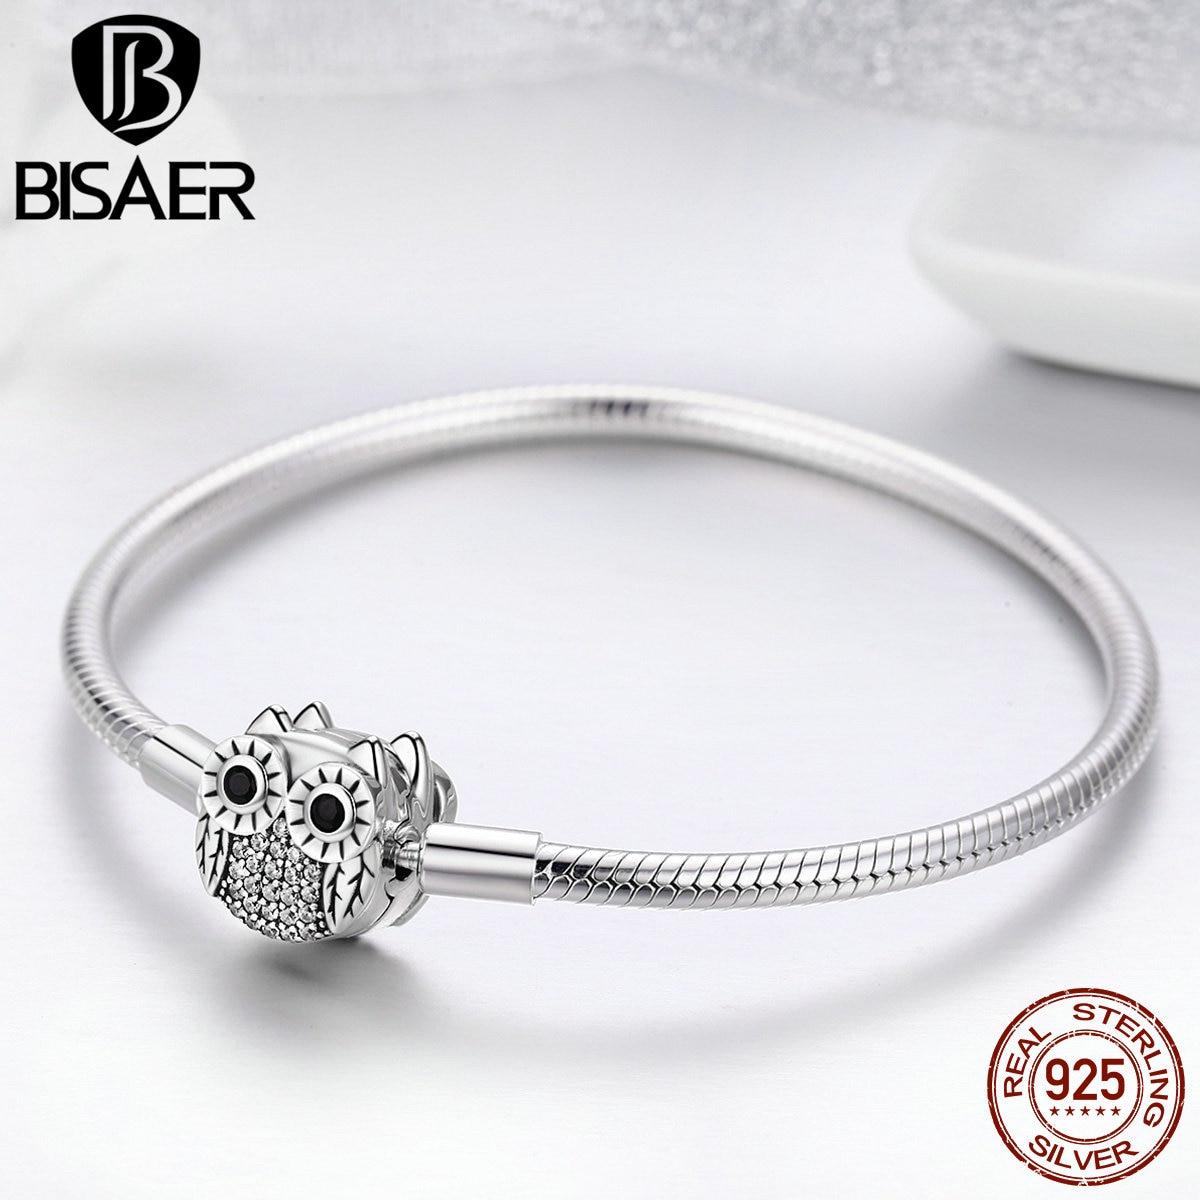 100% 925 Sterling Silver Animal Cute Owl Snake Chain Bracelets for Women Dazzling CZ Bracelets Bangles Authentic Silver Jewelry возлюби свои привычки